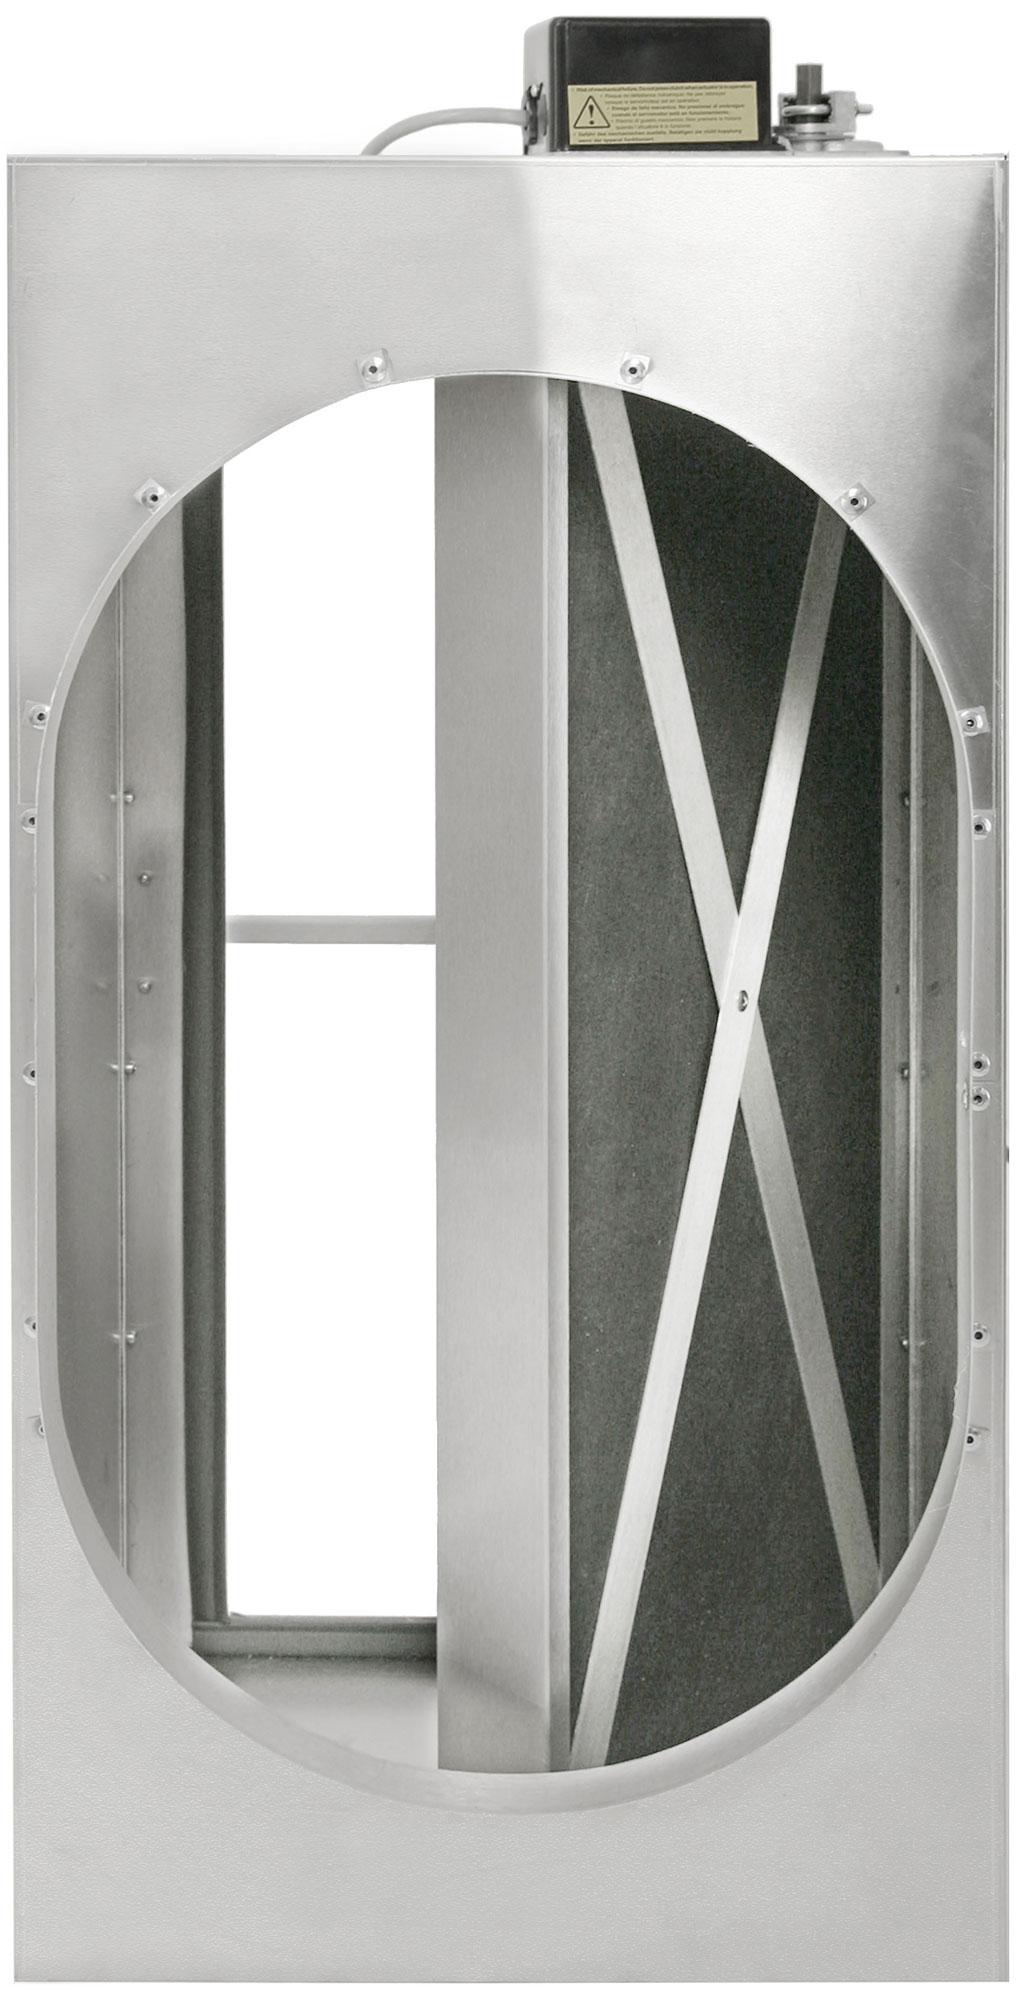 2709 Cfm Whole House Fan Centricair 2 7 Centricair